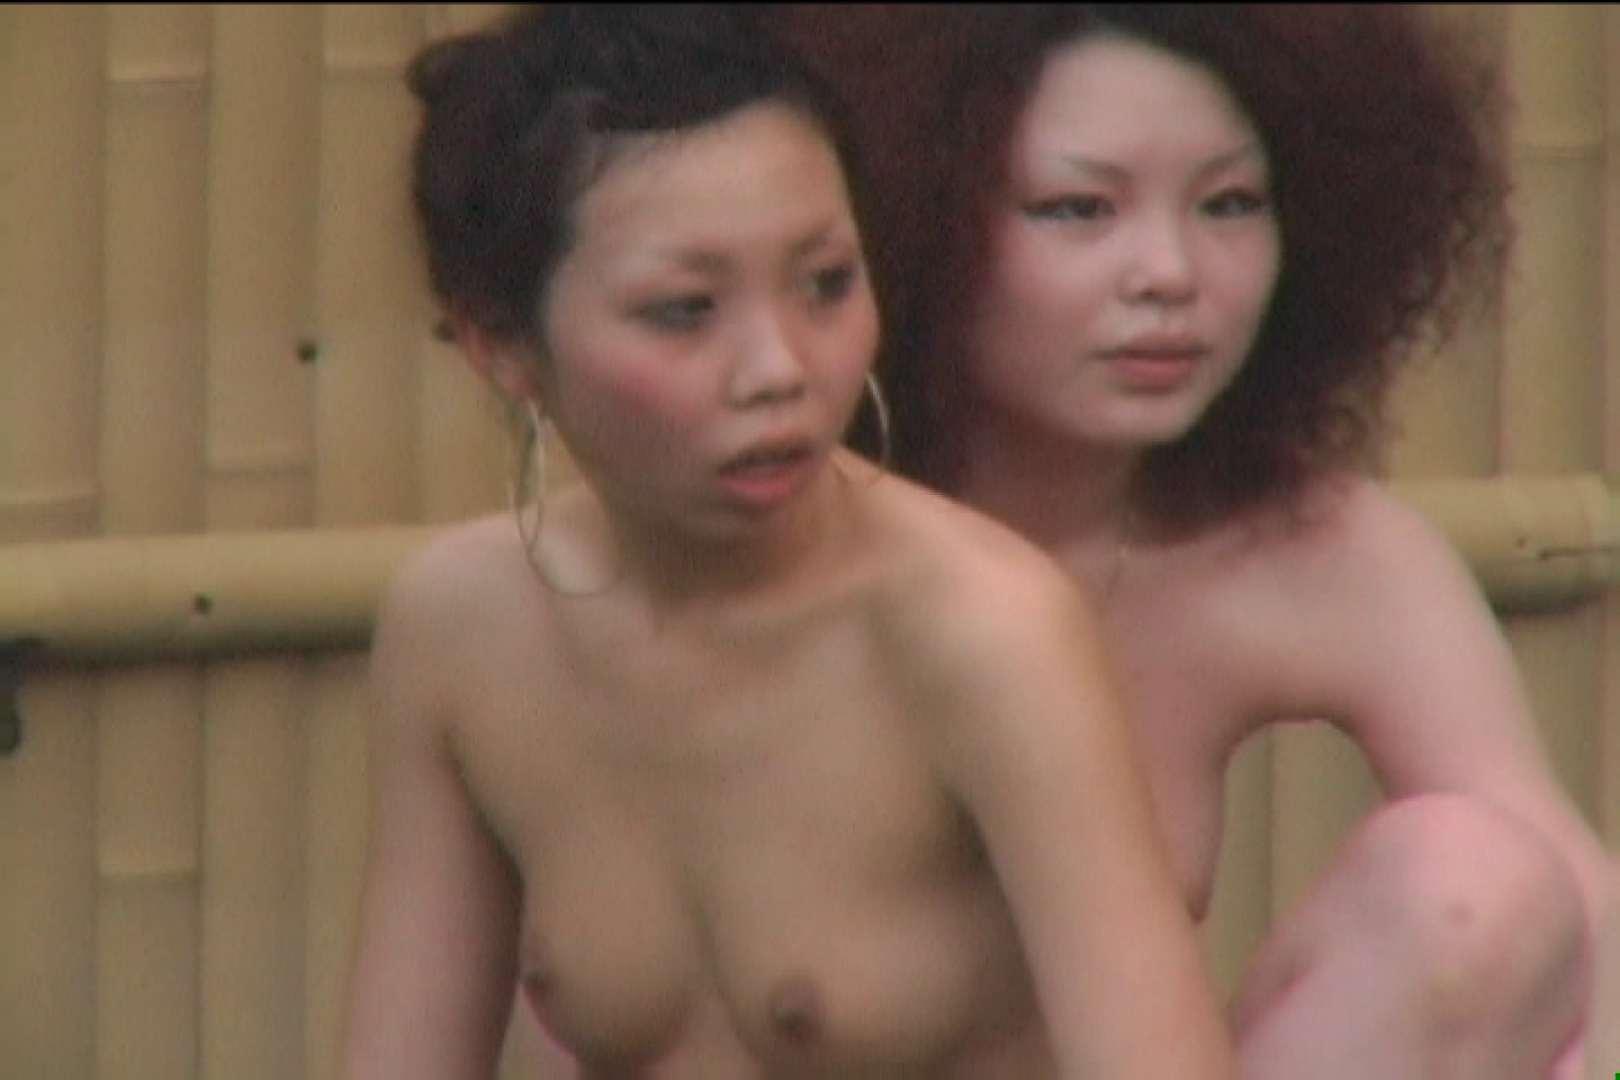 高画質露天女風呂観察 vol.020 OLハメ撮り  32Pix 25